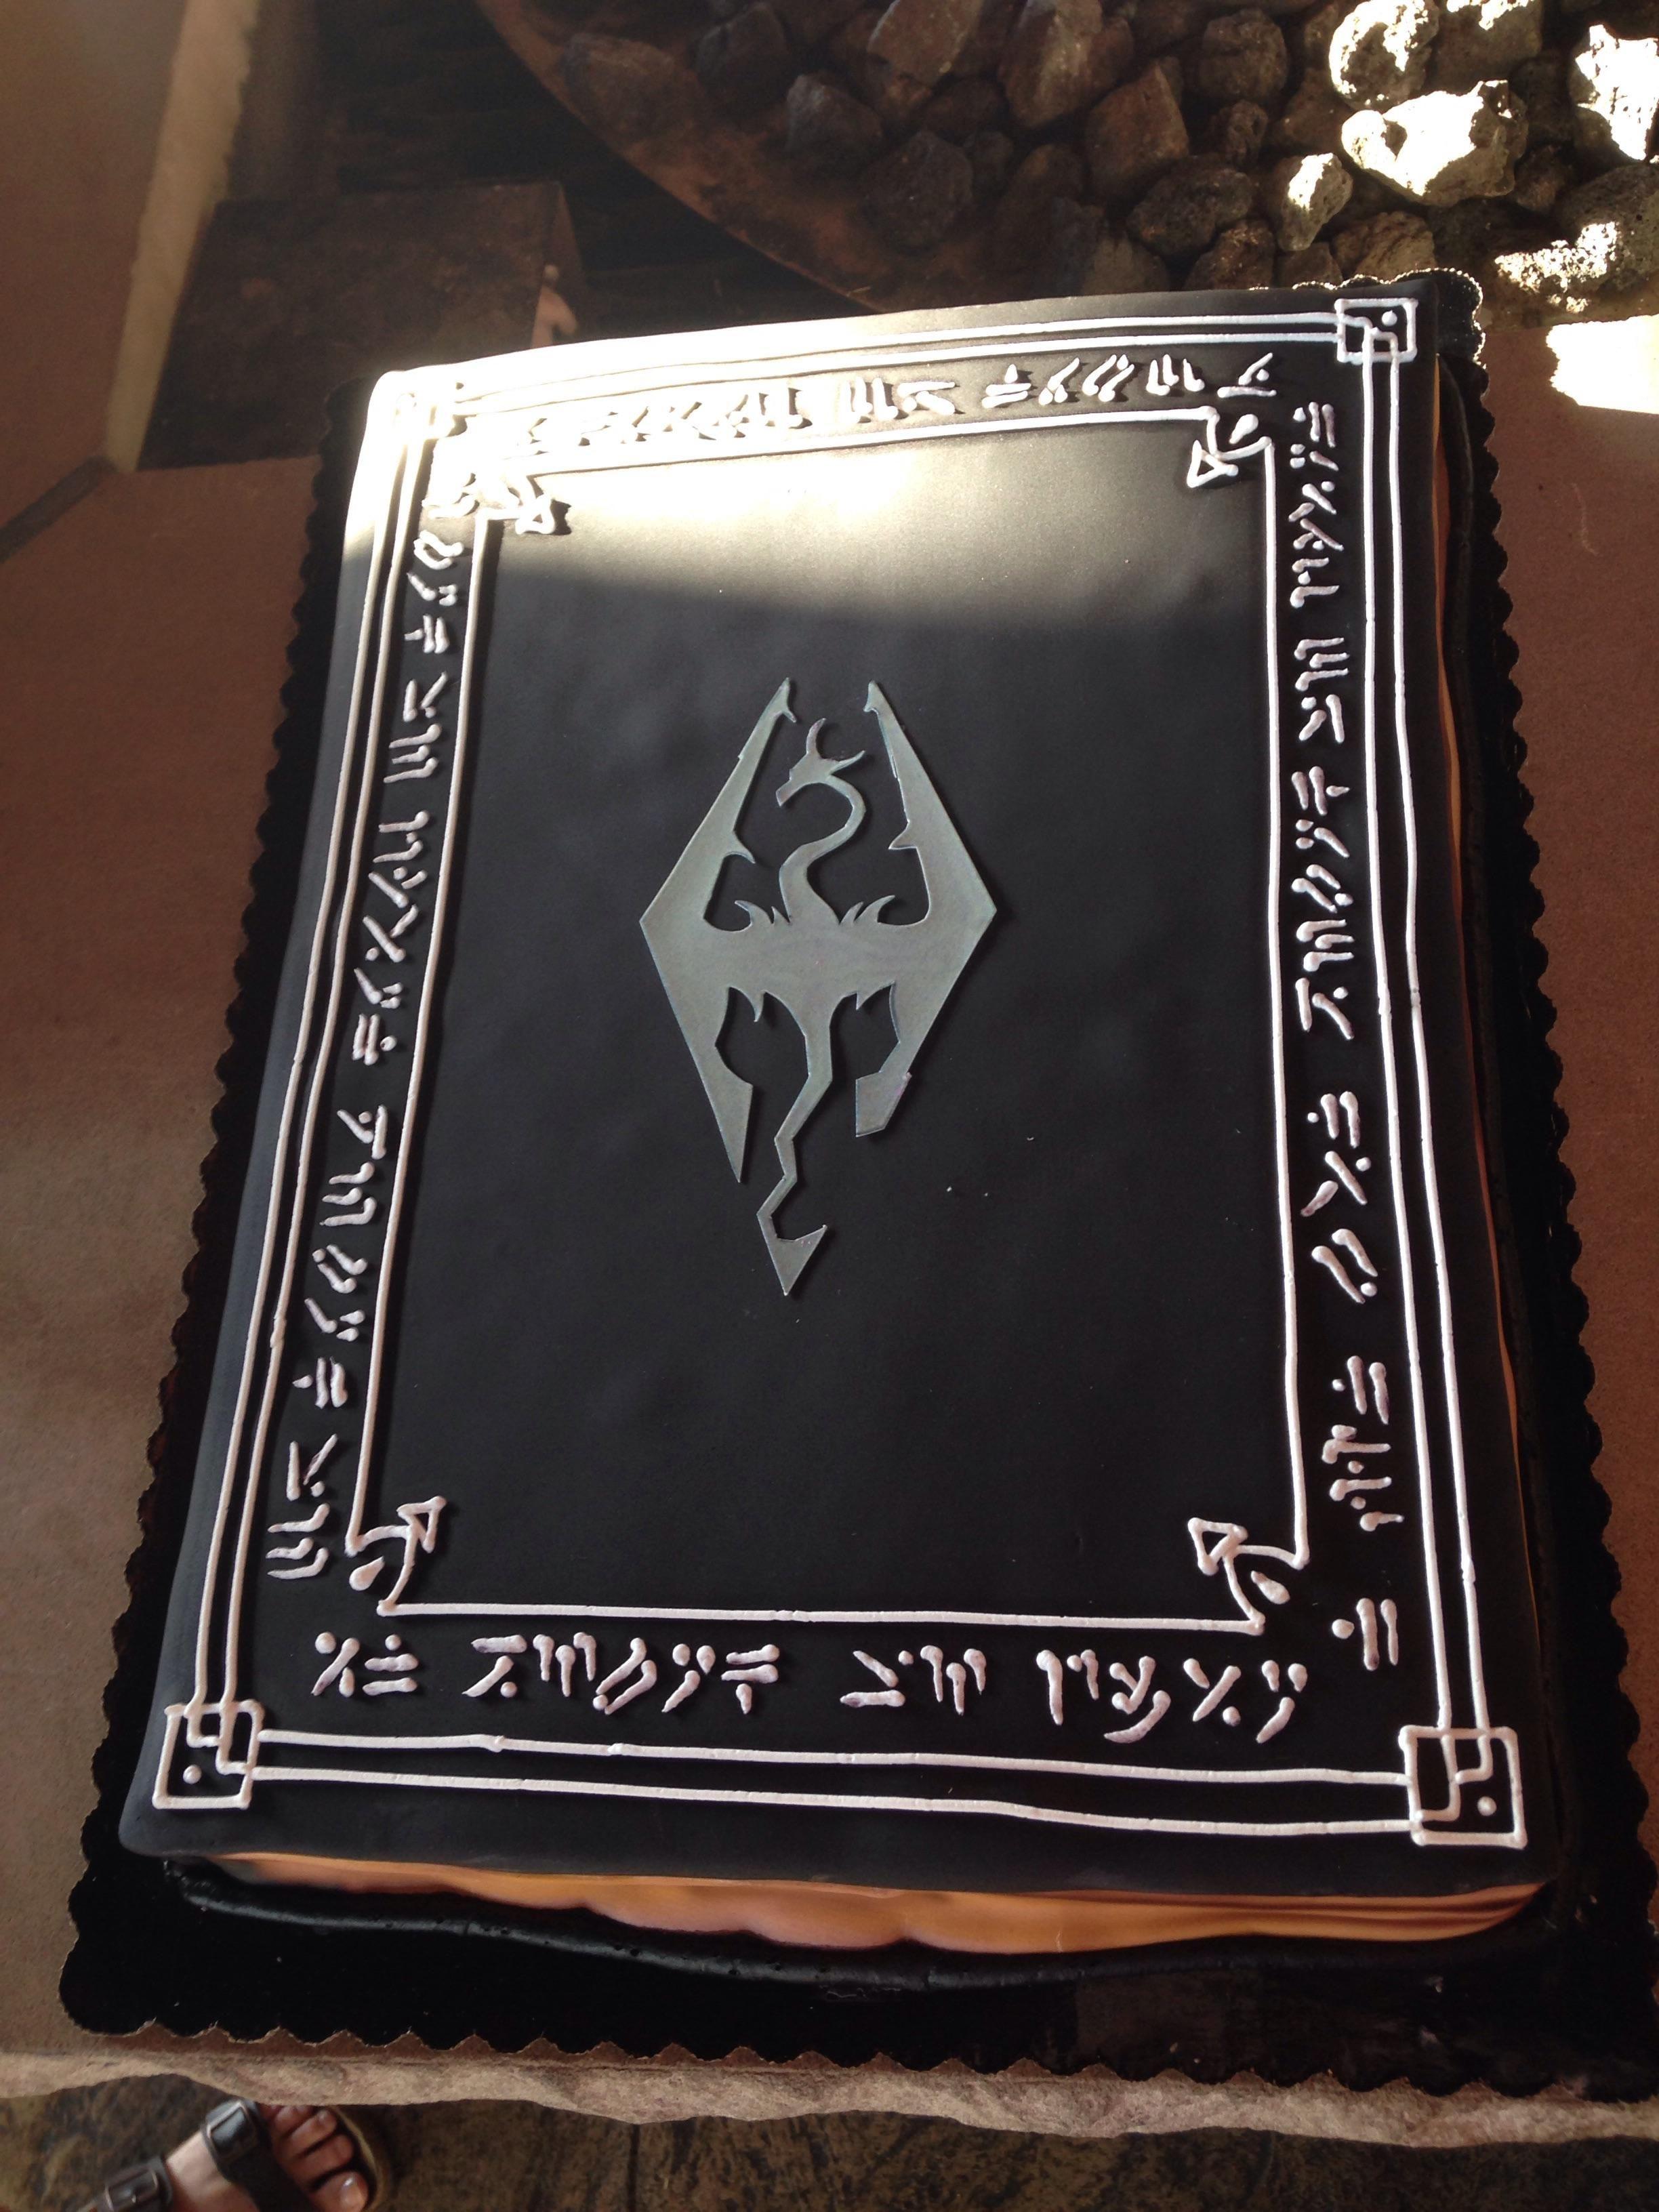 Skyrim book birthday cake games Skyrim elderscrolls BE3 gaming